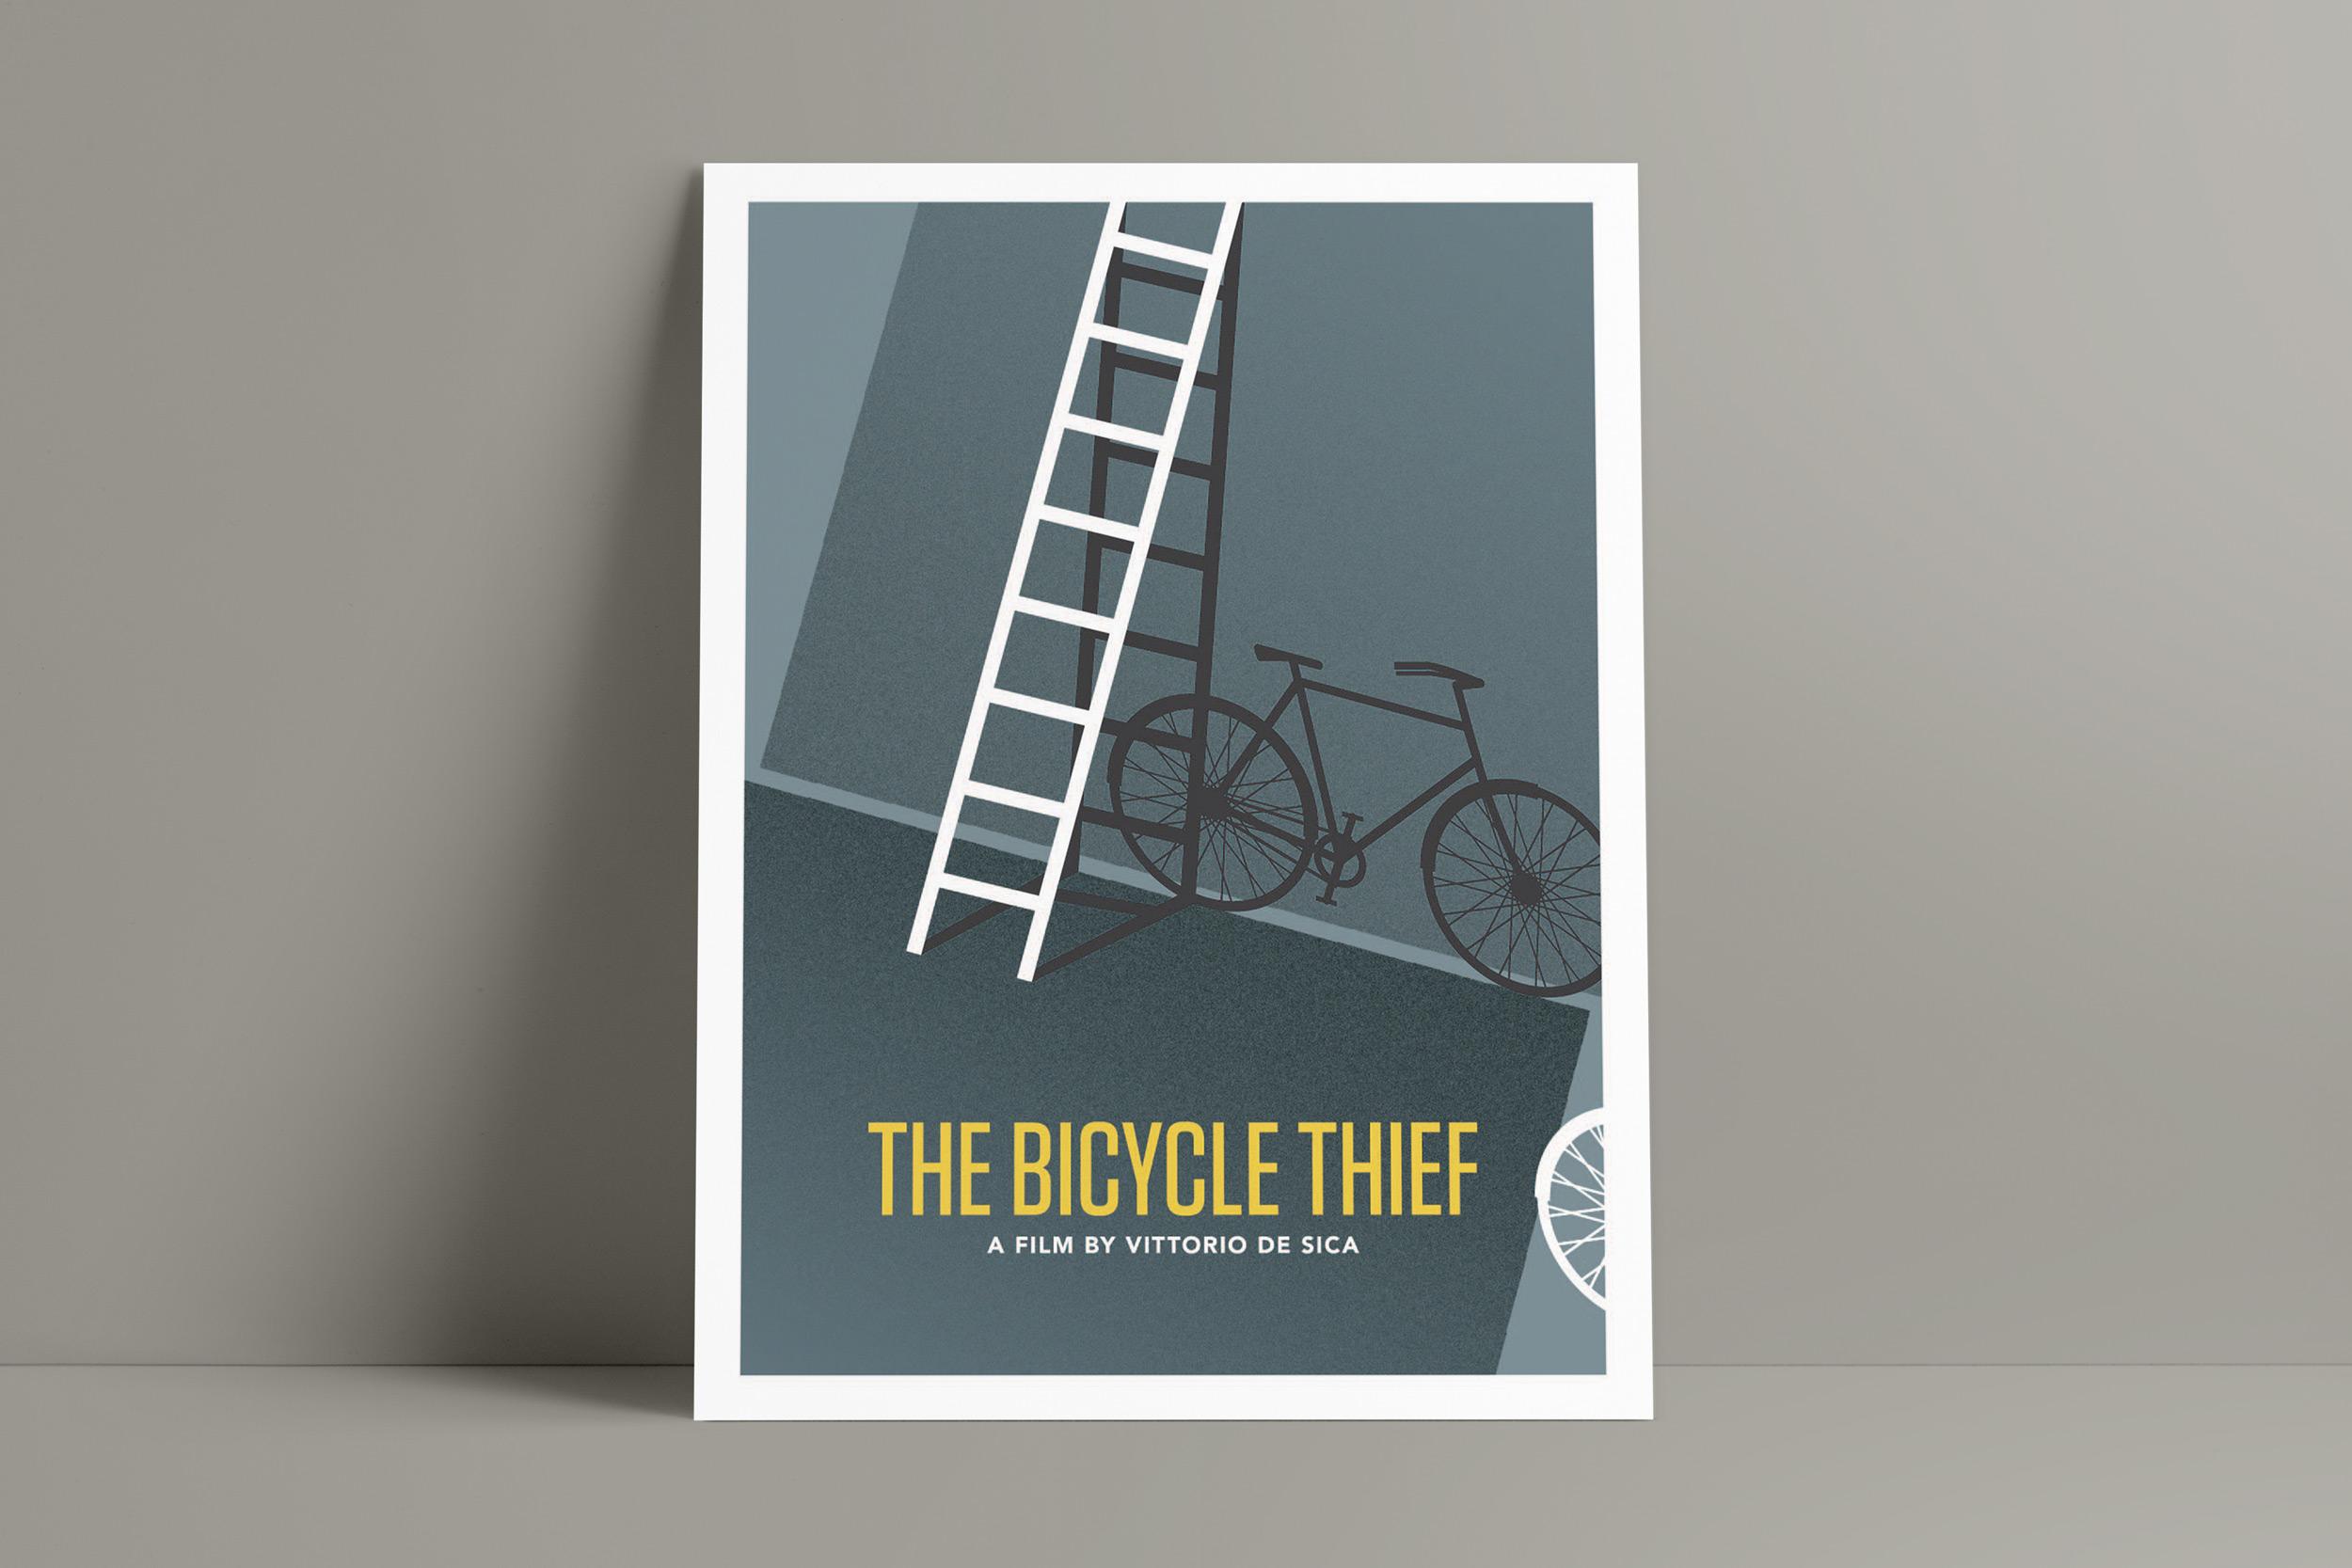 Bicycle-Thief-Poster-Index.jpg